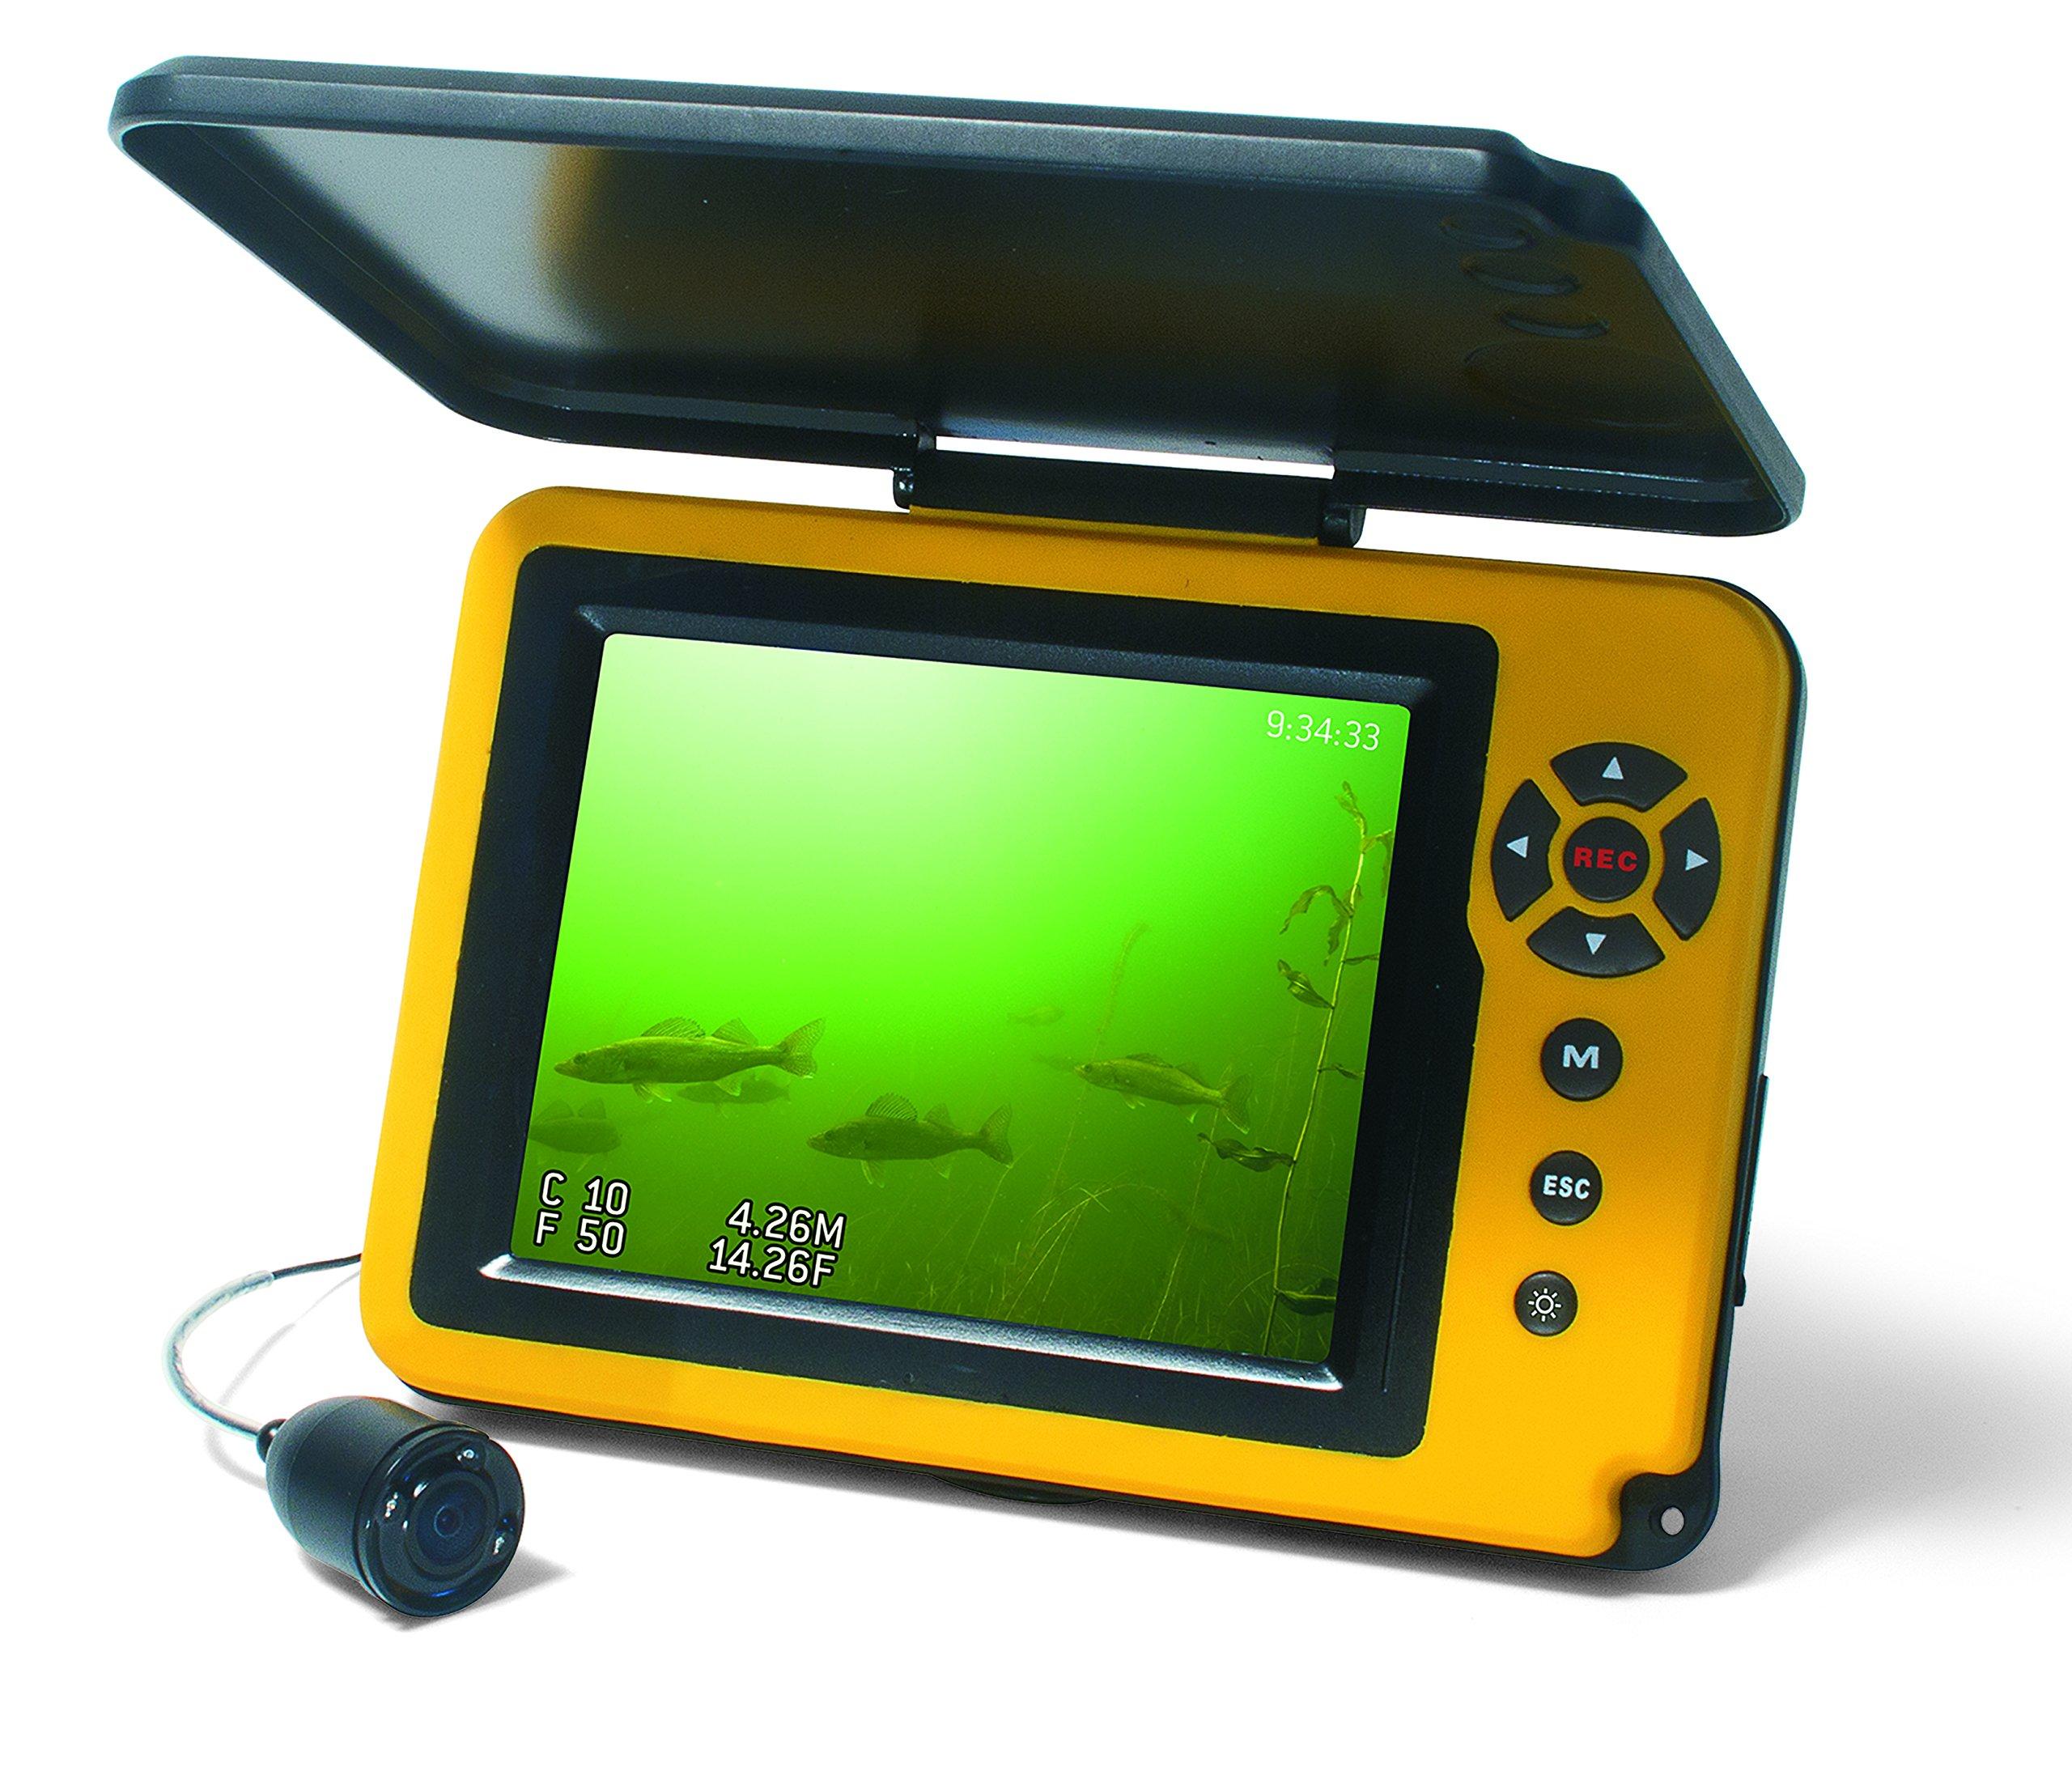 Aqua-Vu AV Micro 5 Plus DVR-DTS Depth & Temperature Underwater Camera with Revolution Cable Management Spool by Aqua-Vu